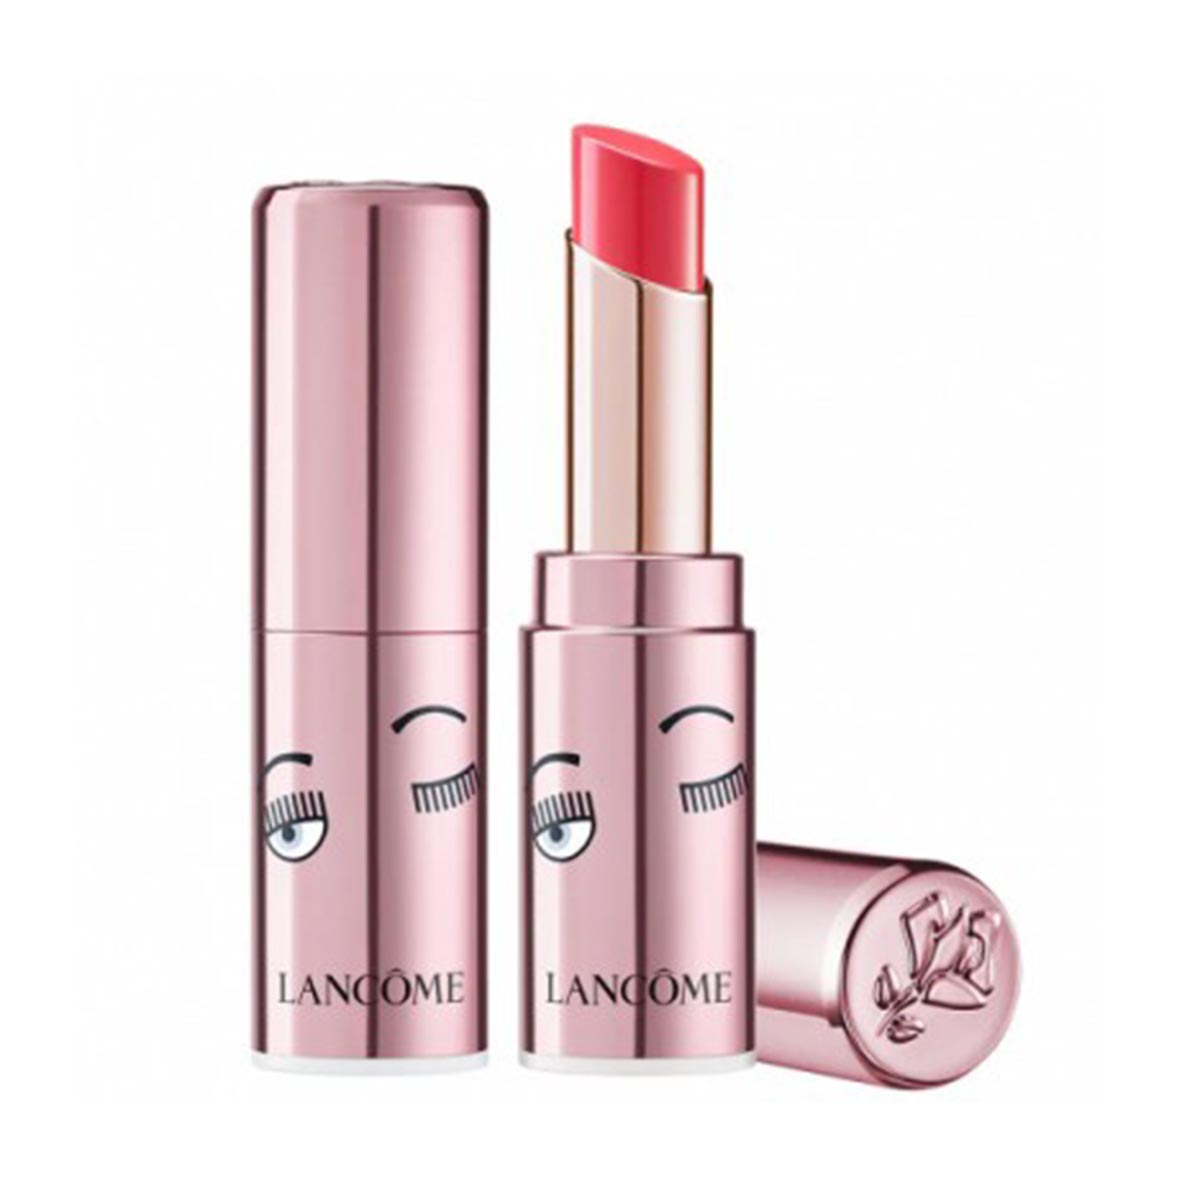 Lancome l absolu mademoiselle shine lipstick 274 love to shin